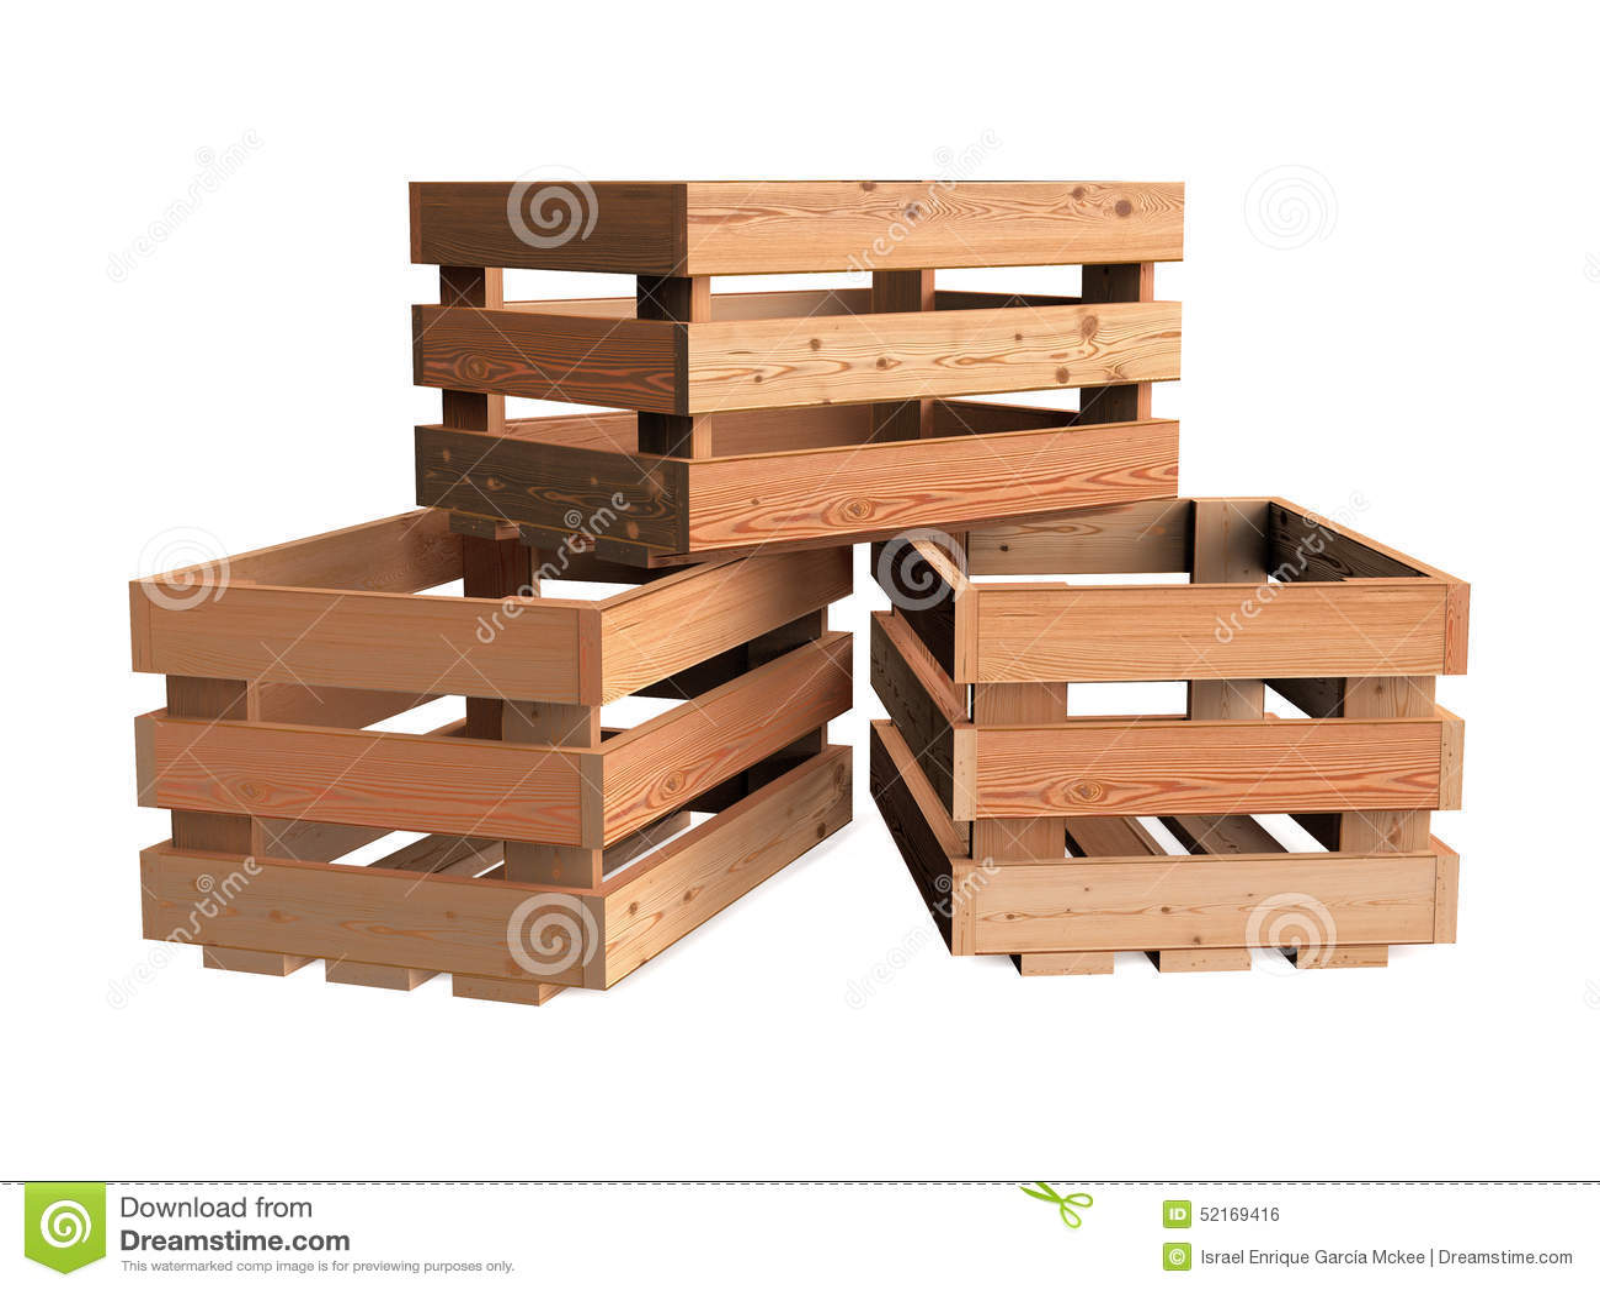 Mont n de cajones de madera stock de ilustraci n imagen 52169416 - Cajones de fruta de madera ...